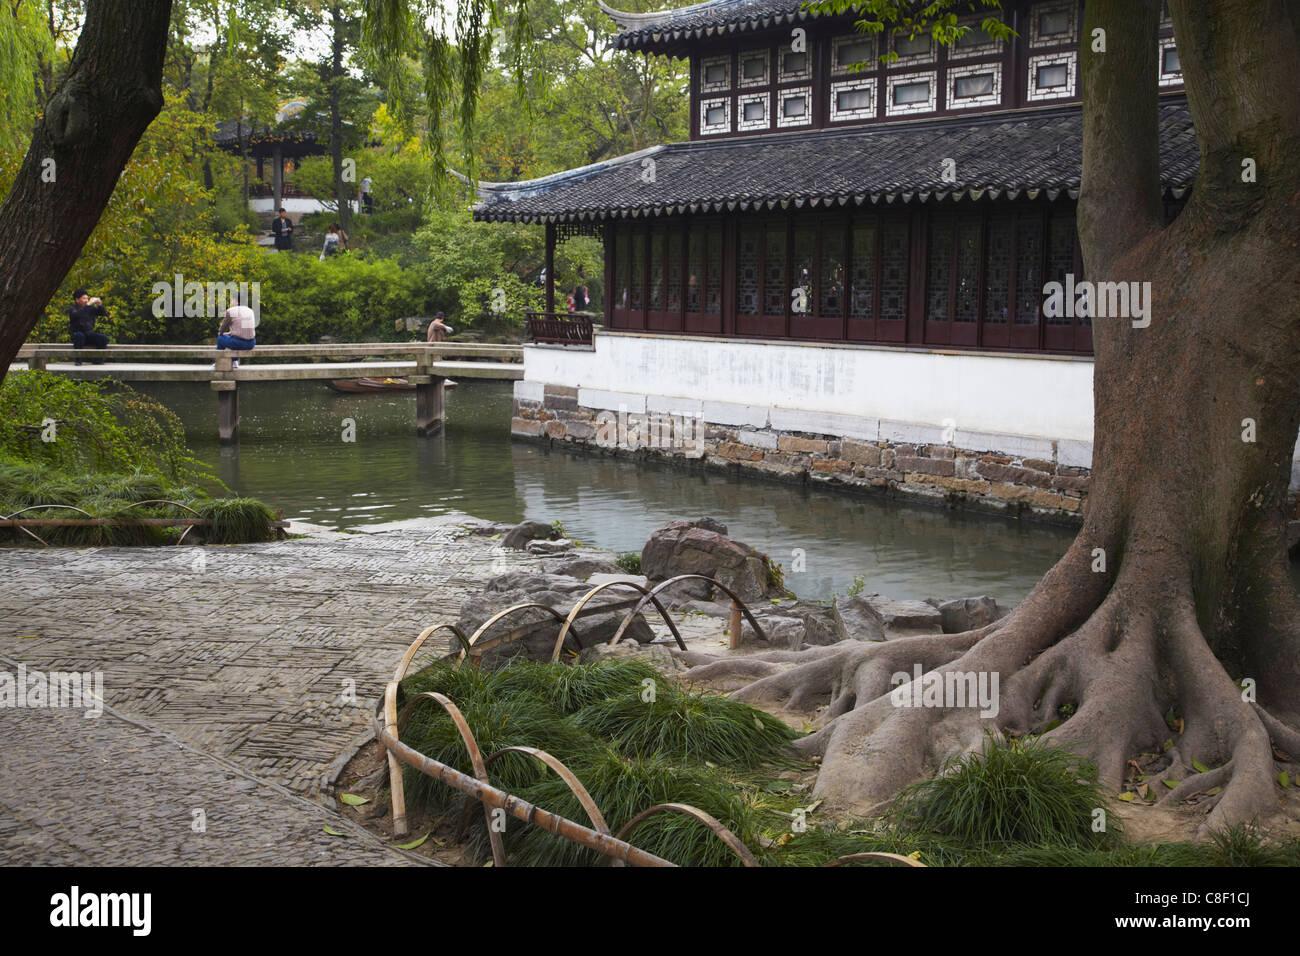 L'Humble Administrator's Garden, Site du patrimoine mondial de l'UNESCO, Suzhou, Jiangsu, Chine Photo Stock